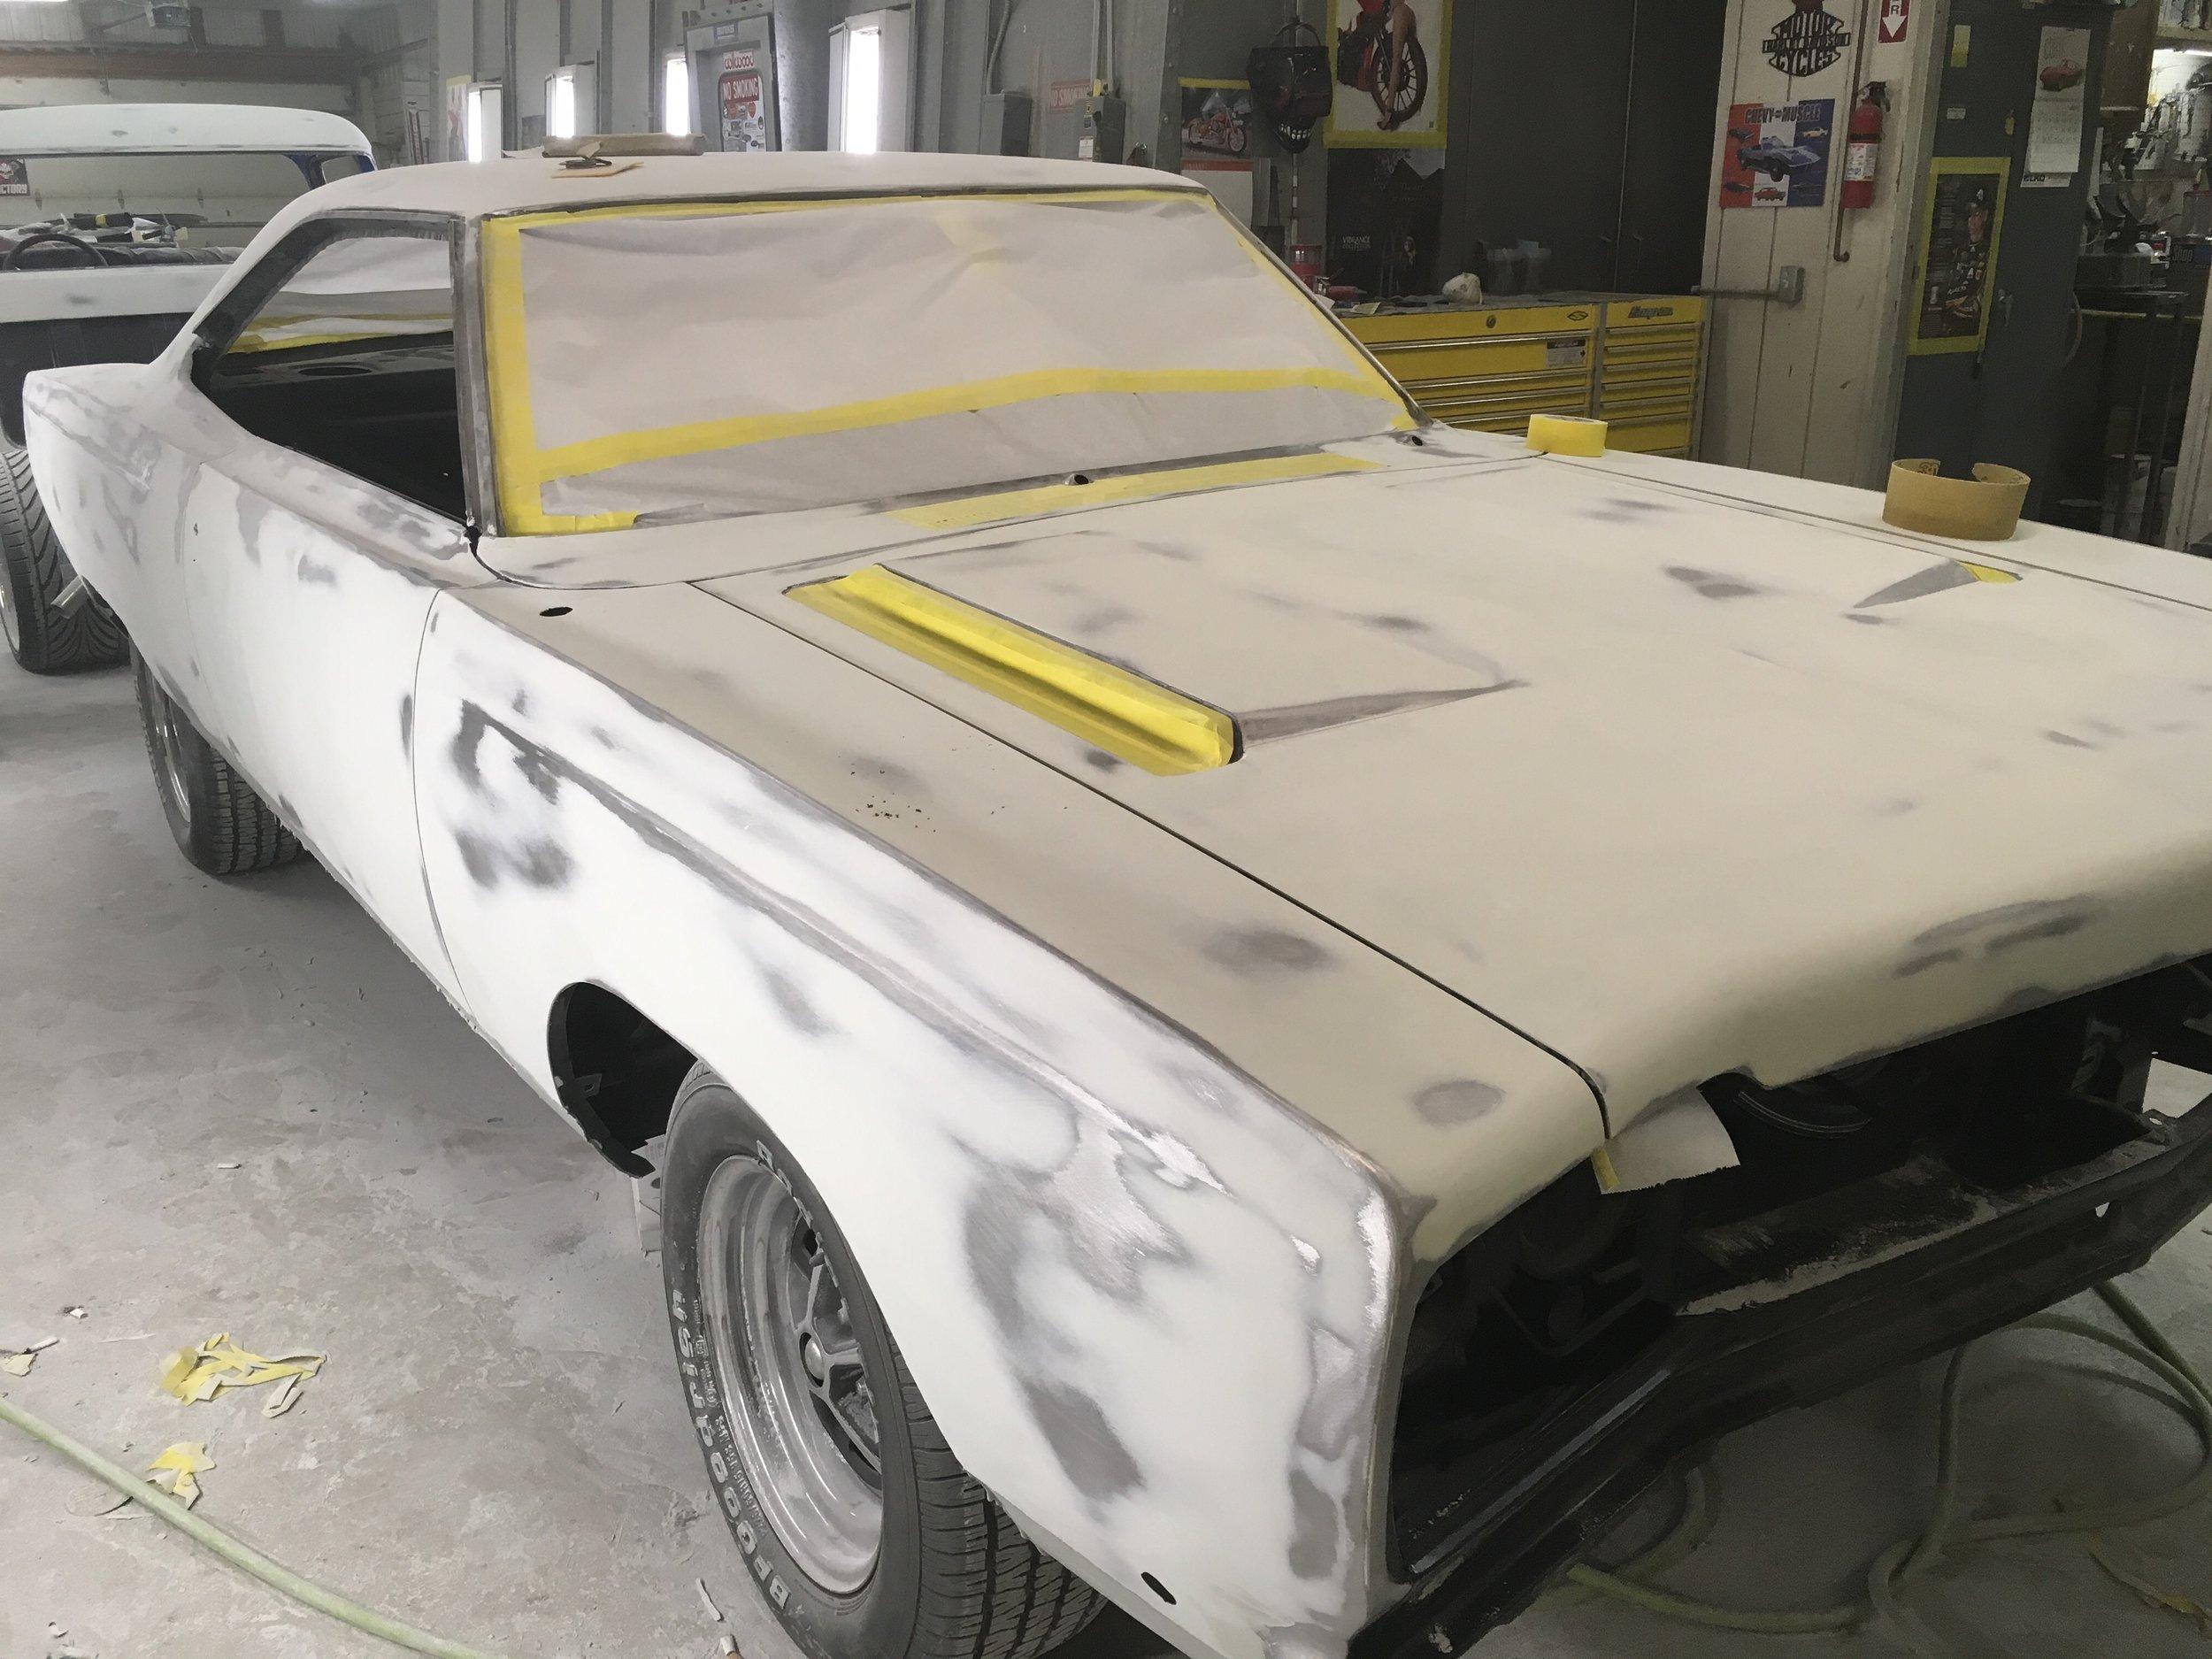 1968-Plymouth-GTX-minneapolis-custom-built-hot-rod-restoration-mud-work.jpg